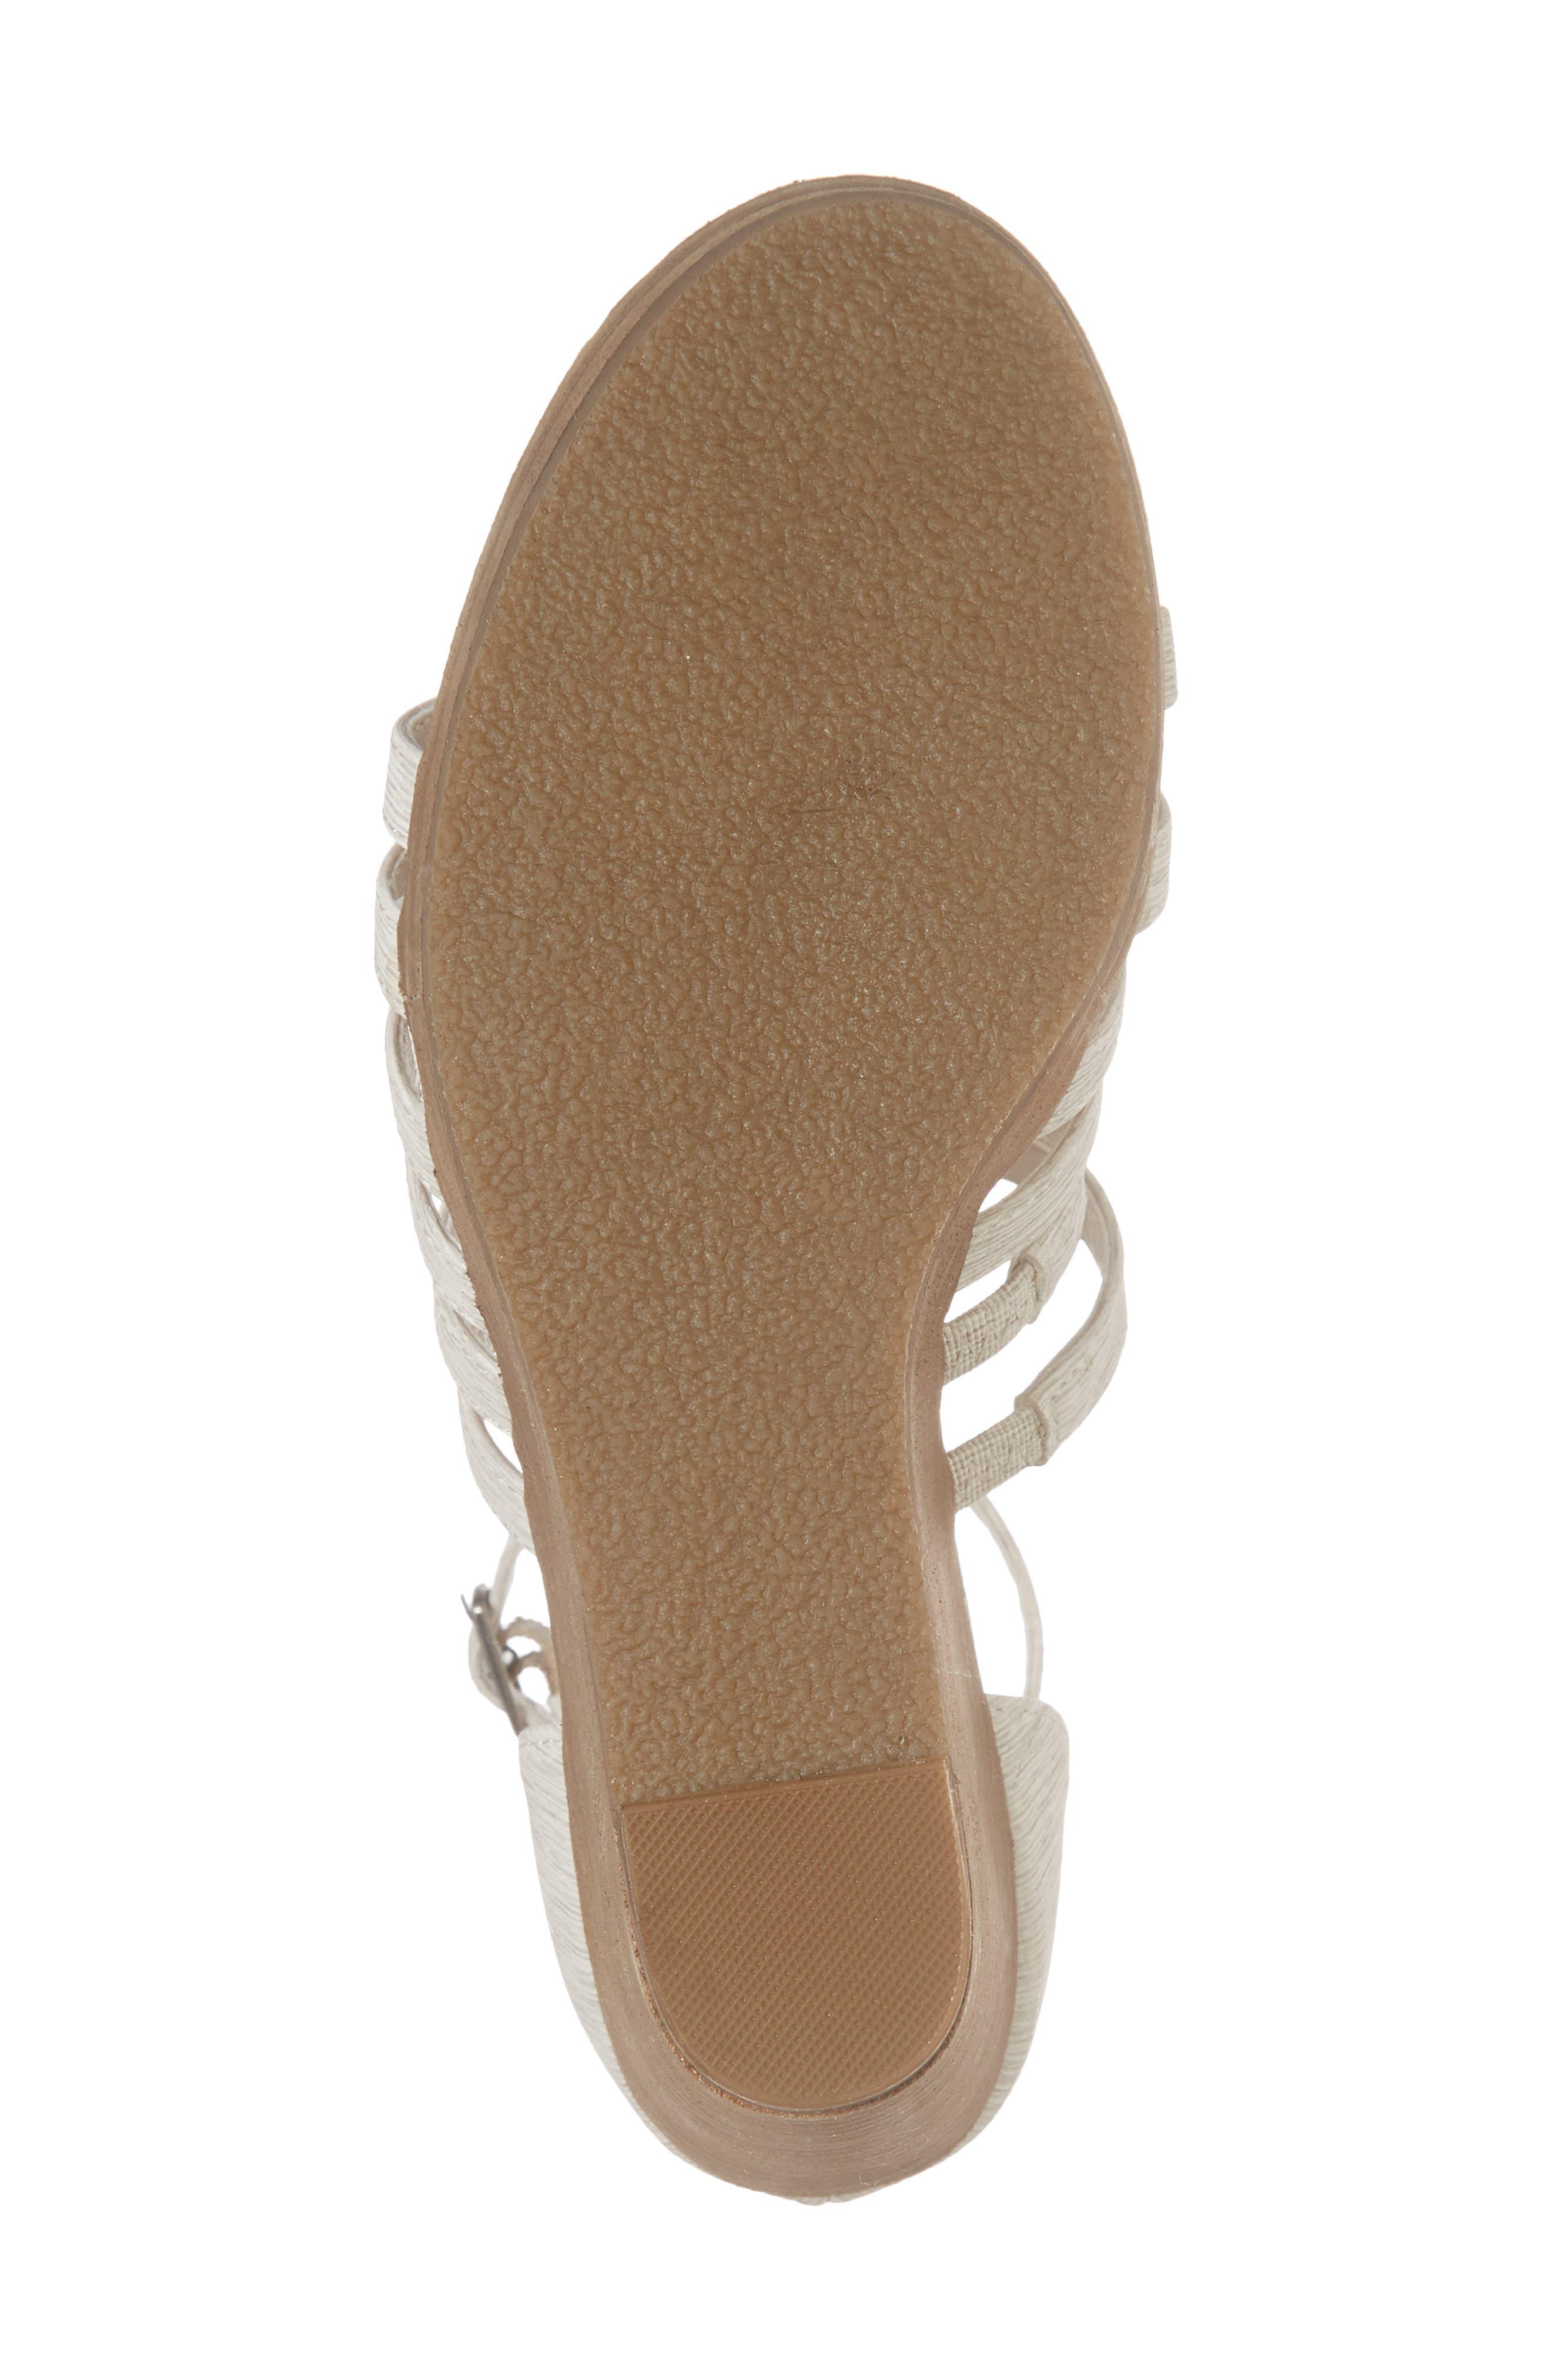 Kiera Wedge Sandal,                             Alternate thumbnail 6, color,                             NATURAL FABRIC